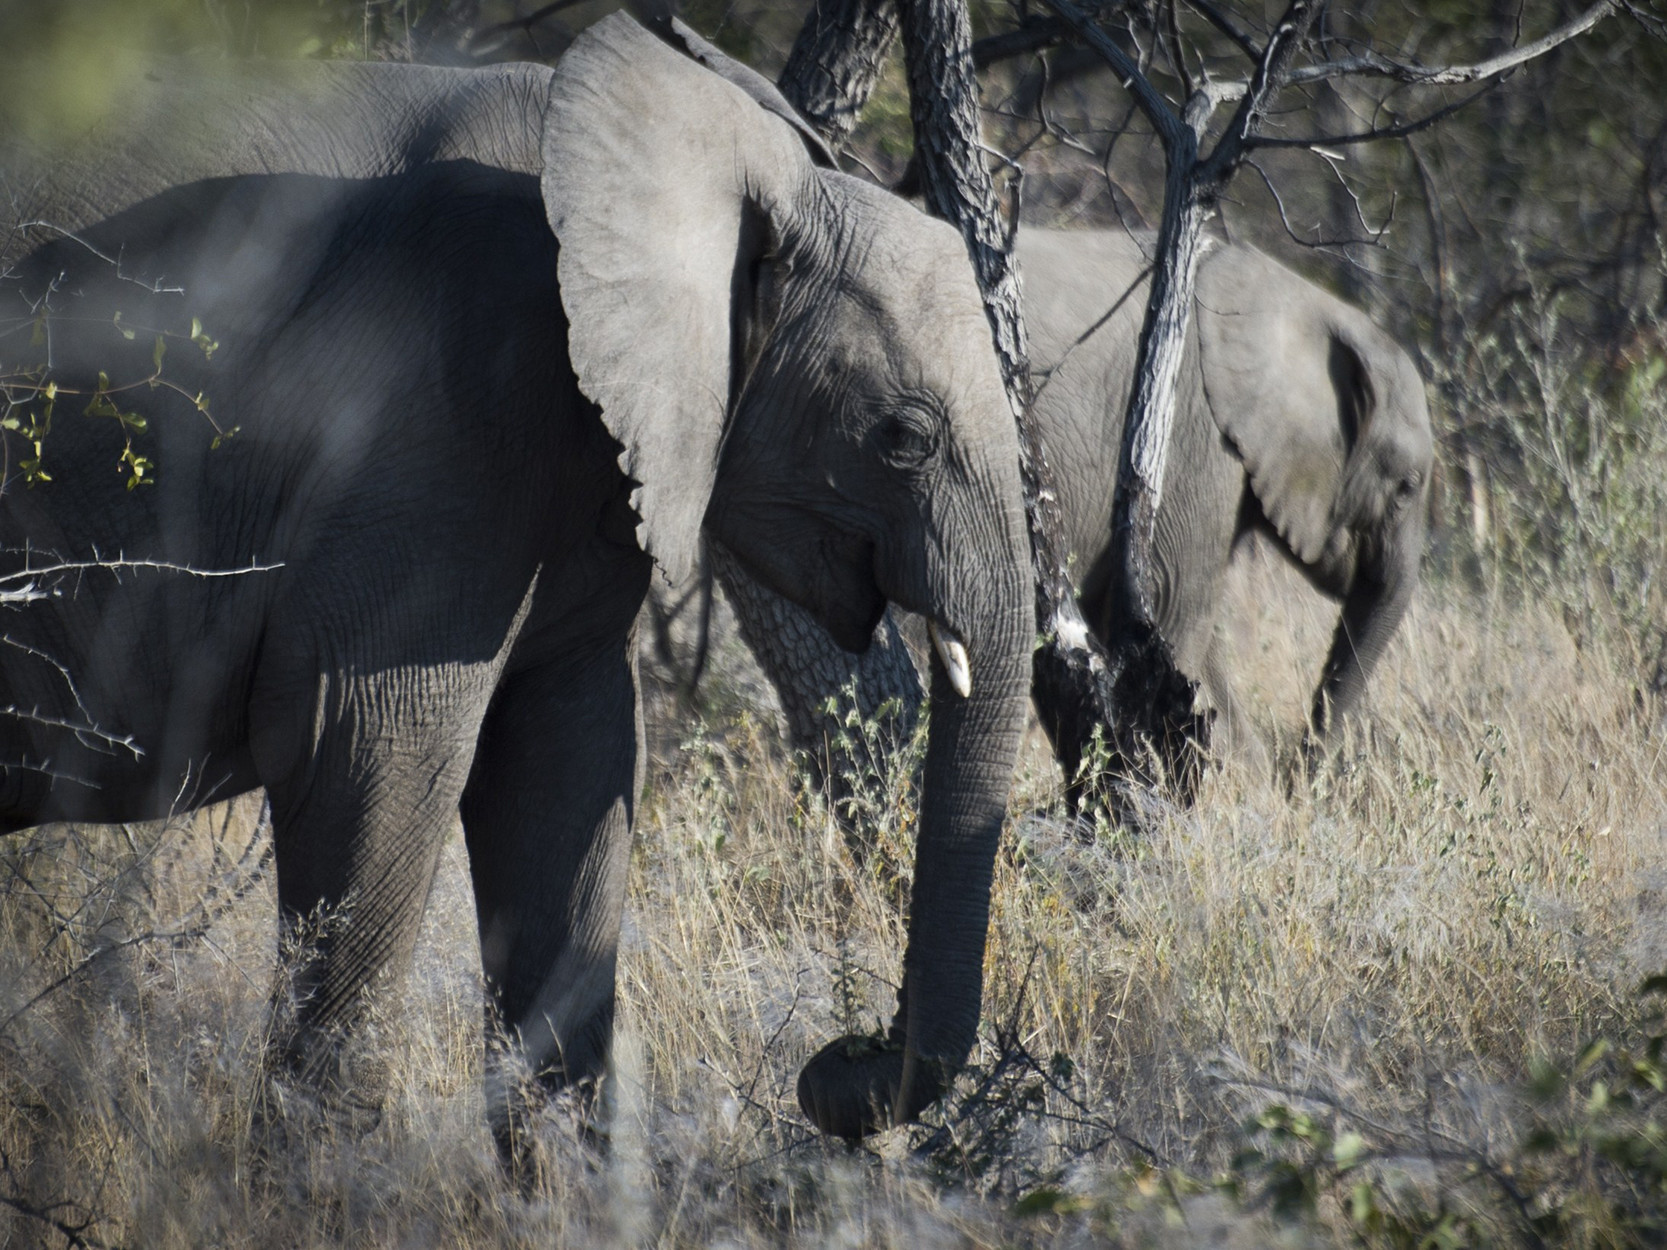 Elephant kills Austrian tourist, 59, during Namibian camping trip